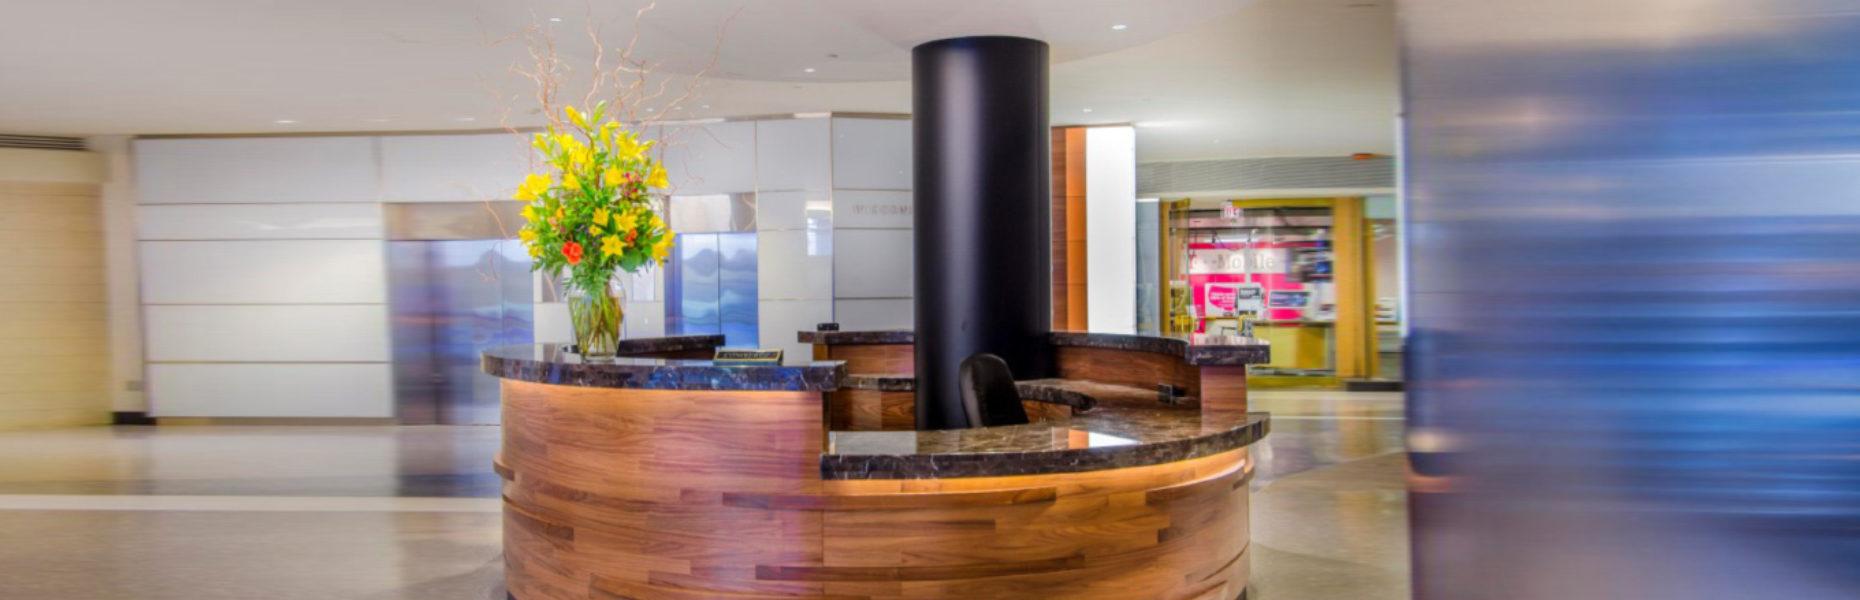 Chevy Chase Pavillion, Chevy Chase, MD. Custom Concierge Desk  Material: Quartz Architect: Streetsense General Contractor: Hitt